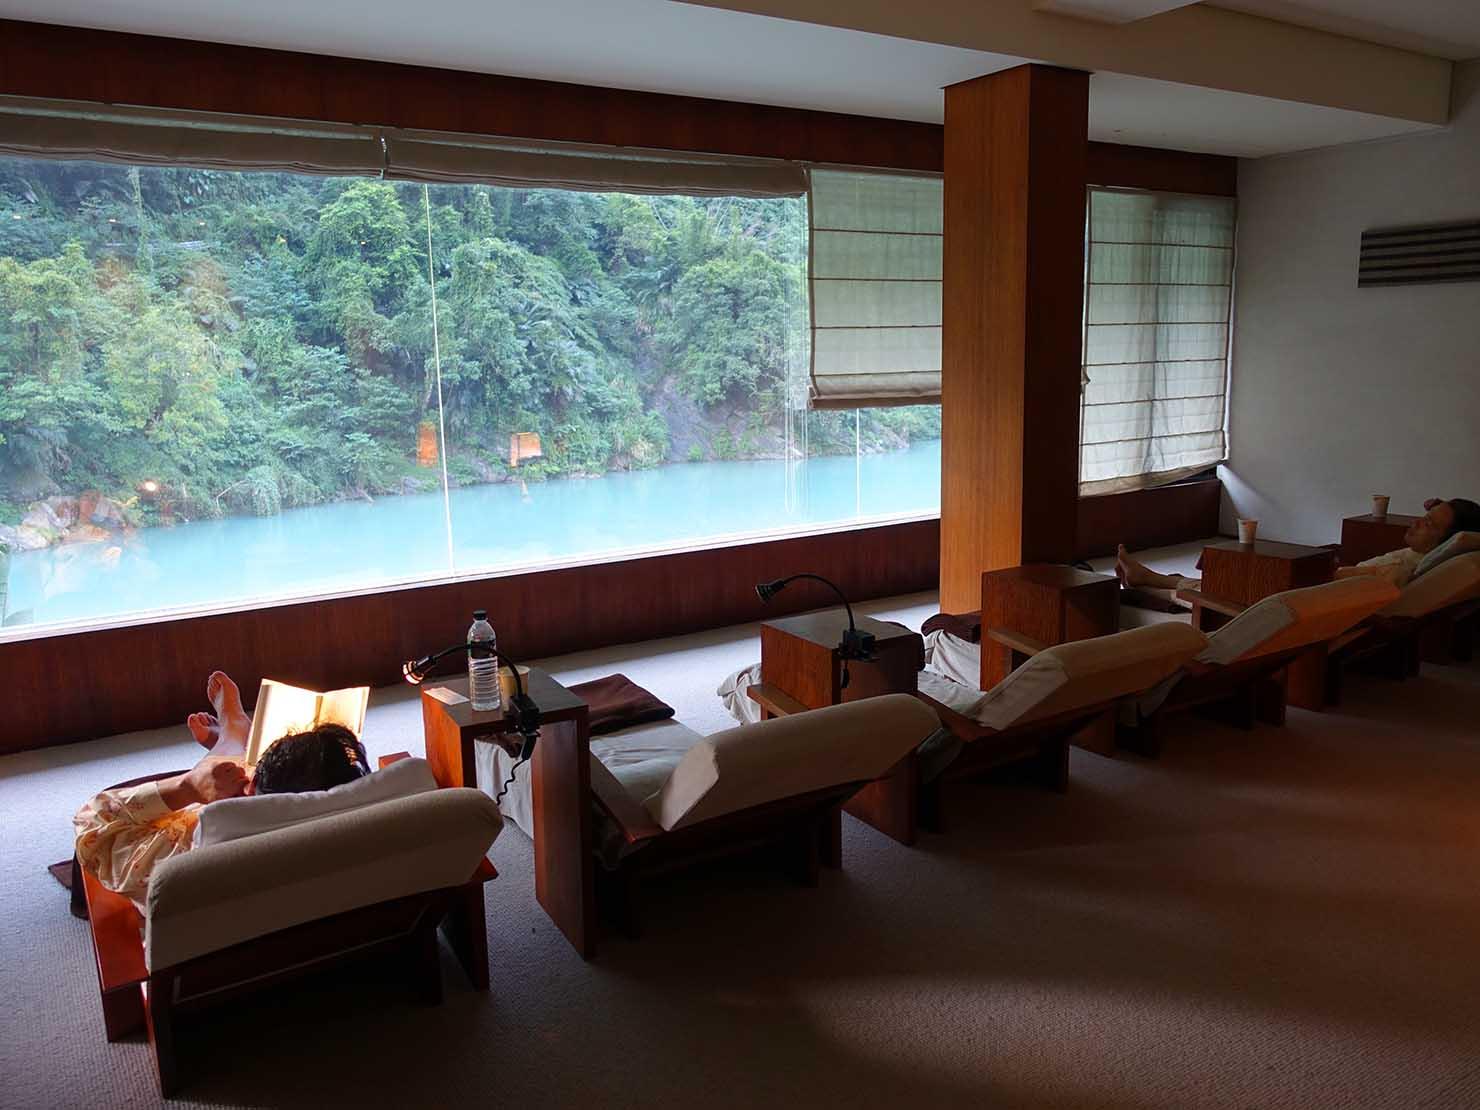 台北・烏來温泉「Volando Urai Spring Spa & Resort 馥蘭朵烏來渡假酒」の休憩スペース